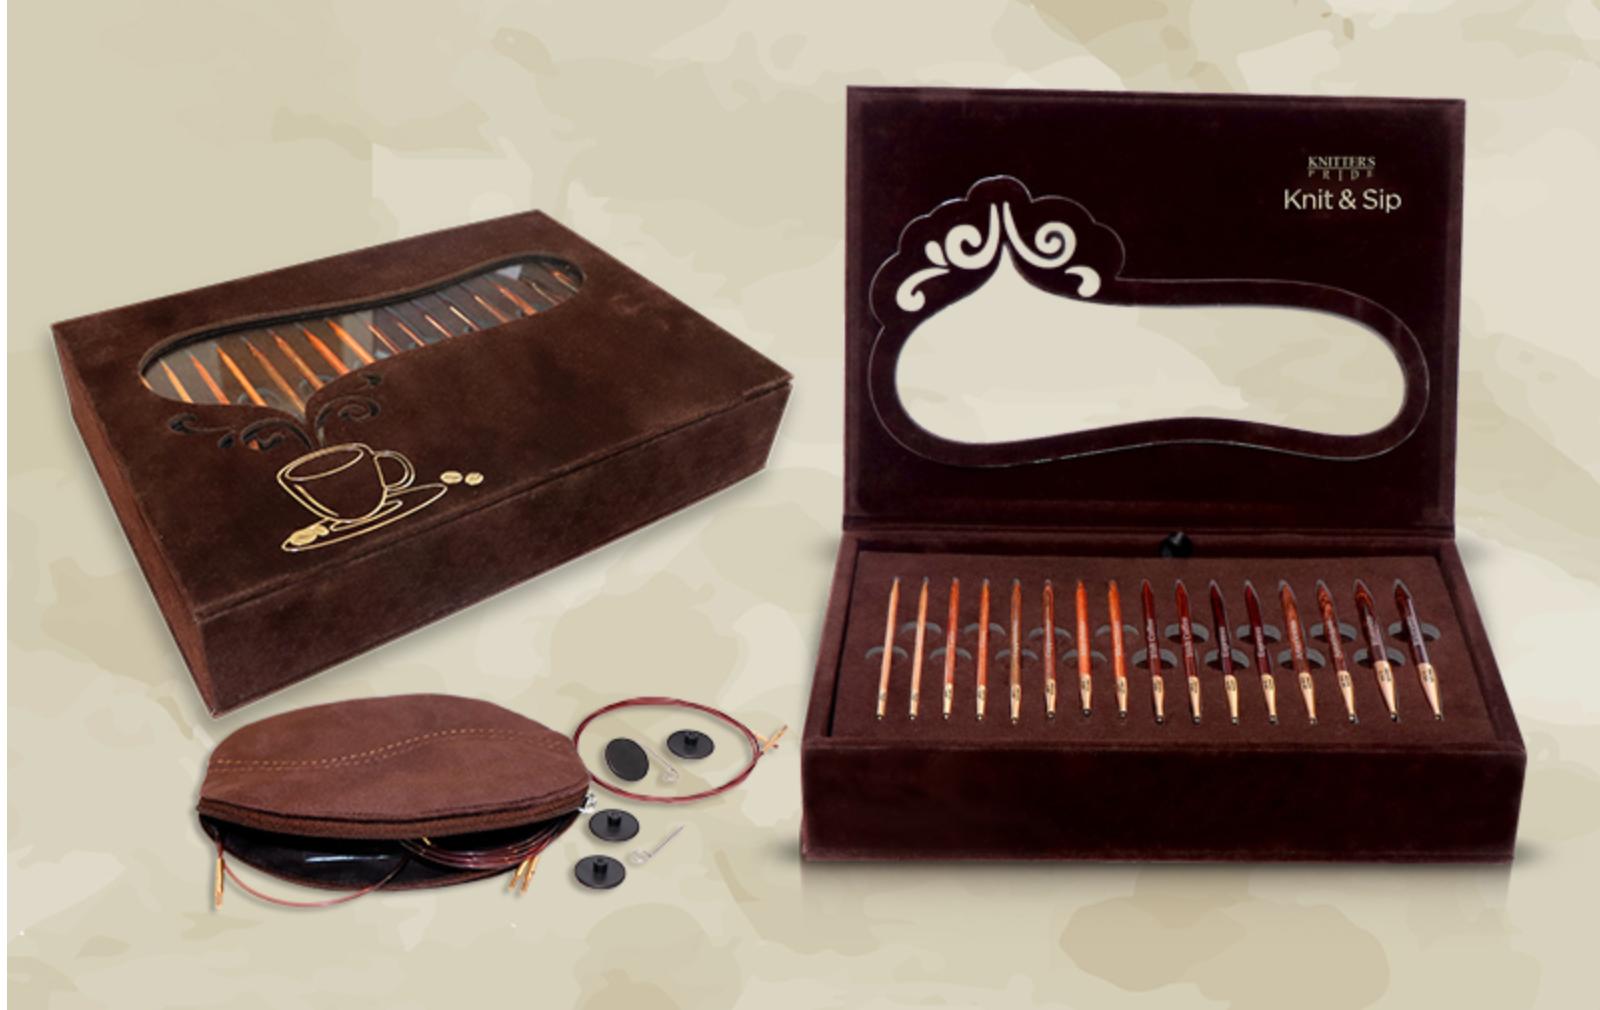 Knit & Sip Needle Set